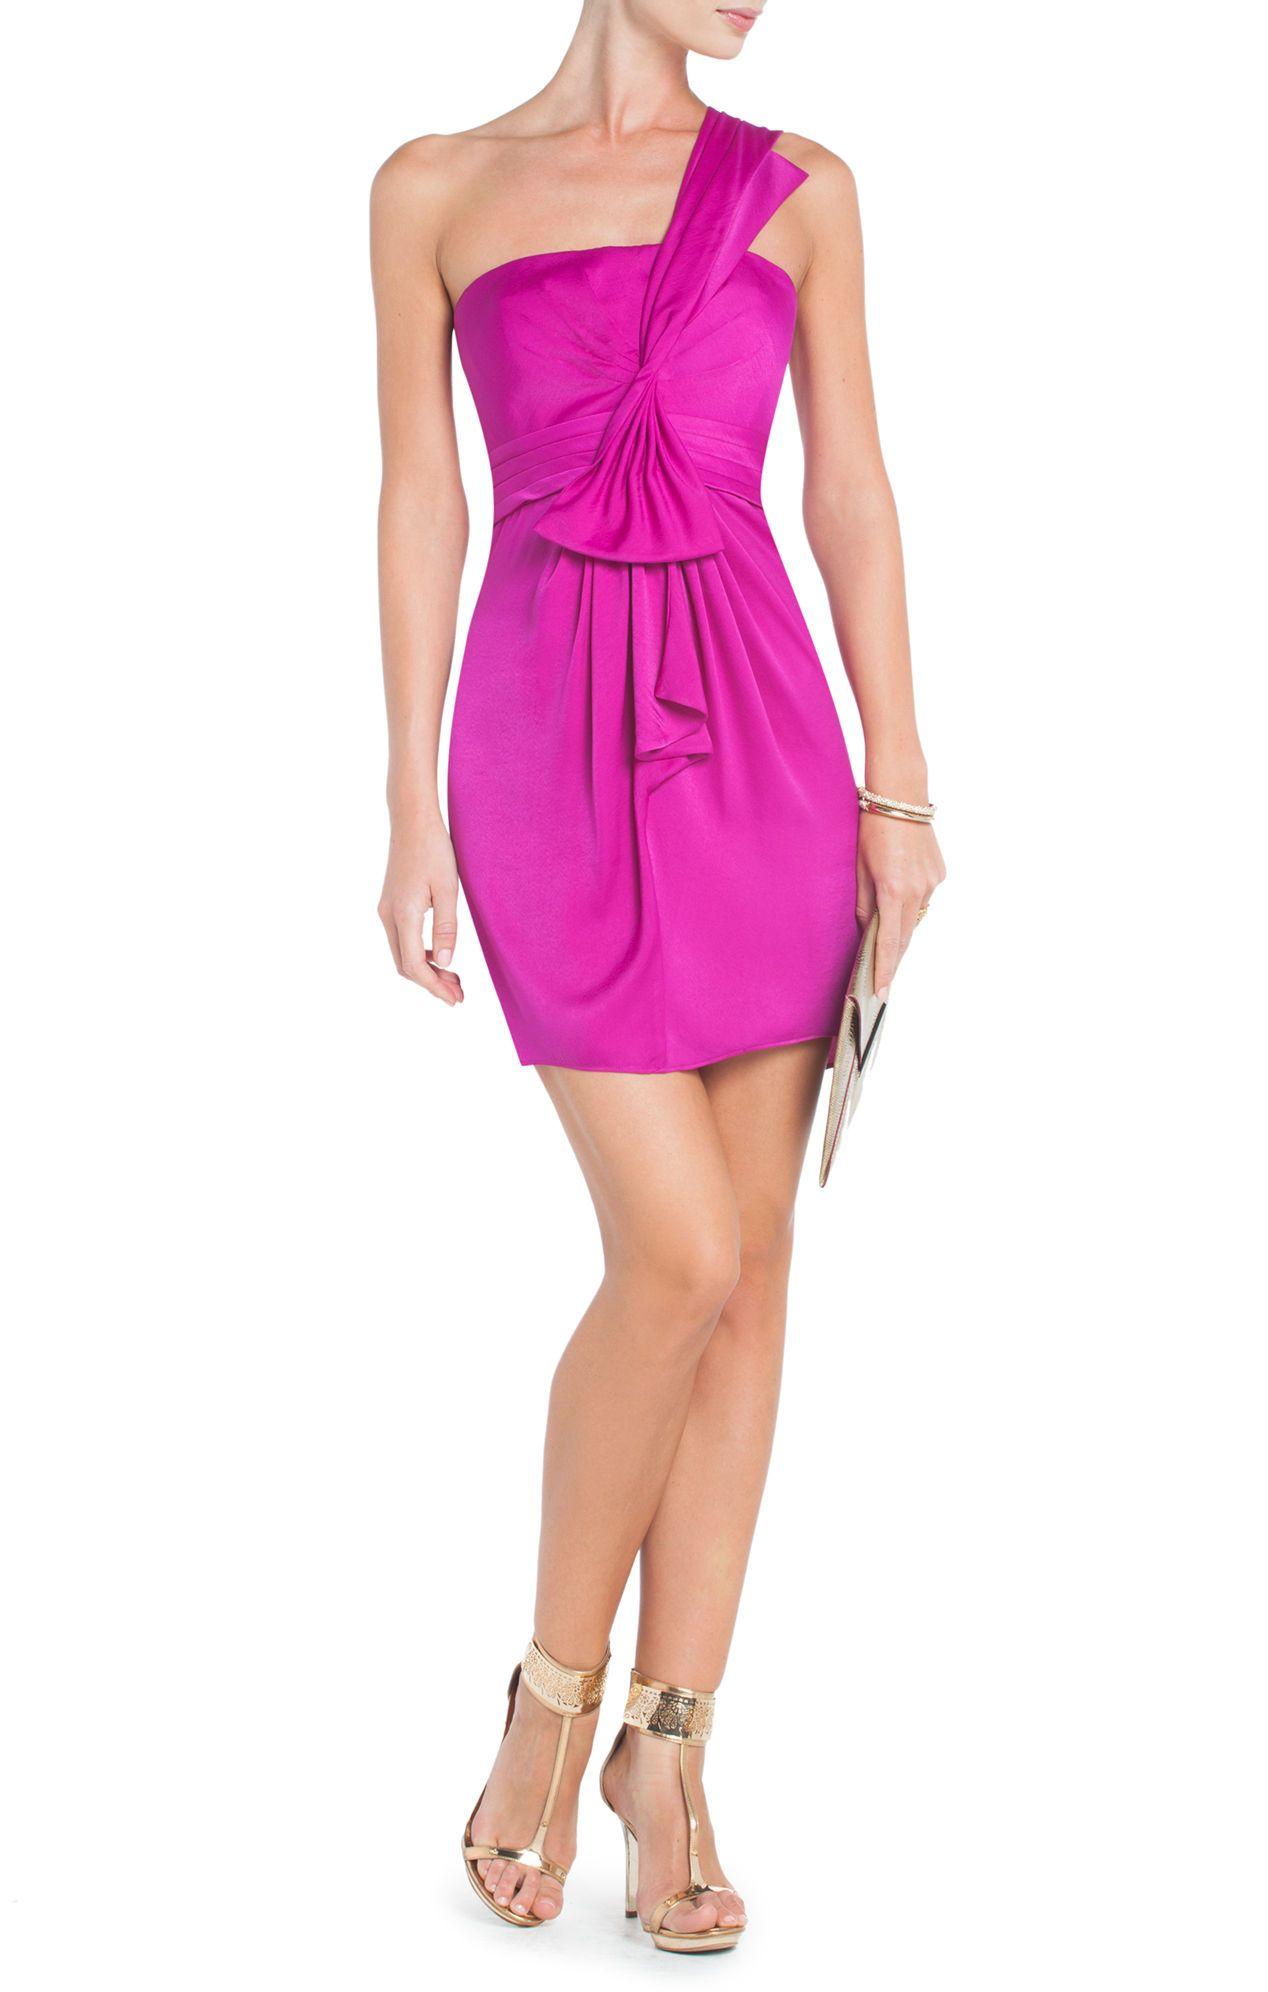 Palais One-Shoulder Cocktail Dress | BCBG | Vestidos | Pinterest ...